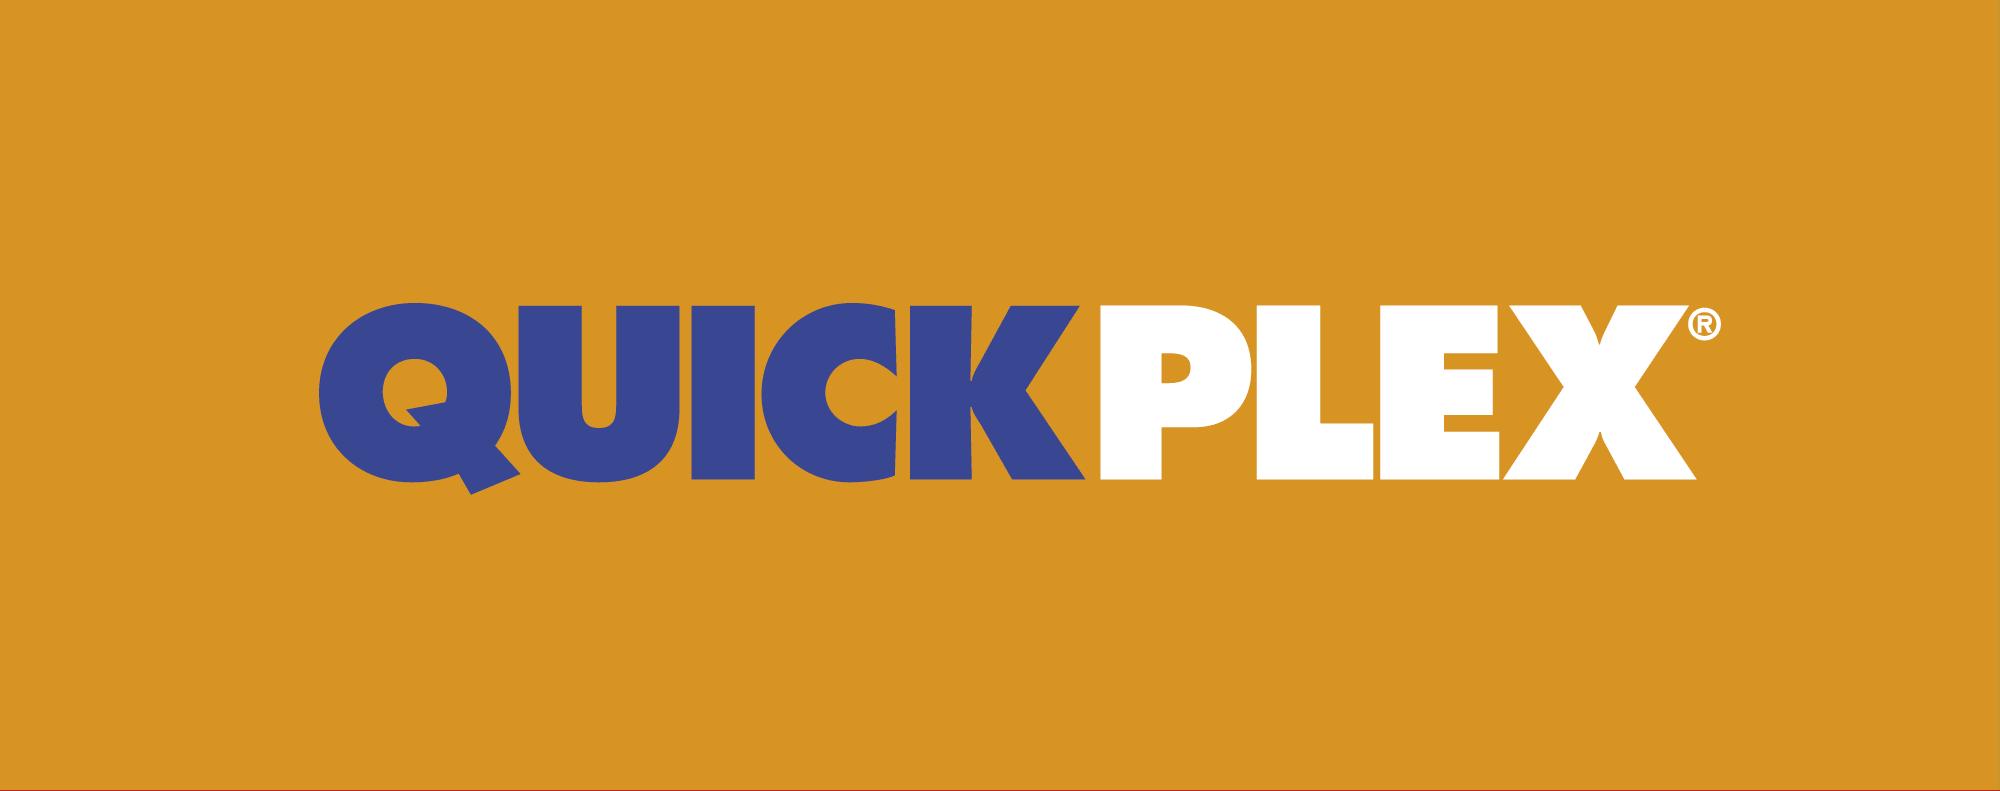 logo-quickplex-huistopper-witzand-bouwmaterialen